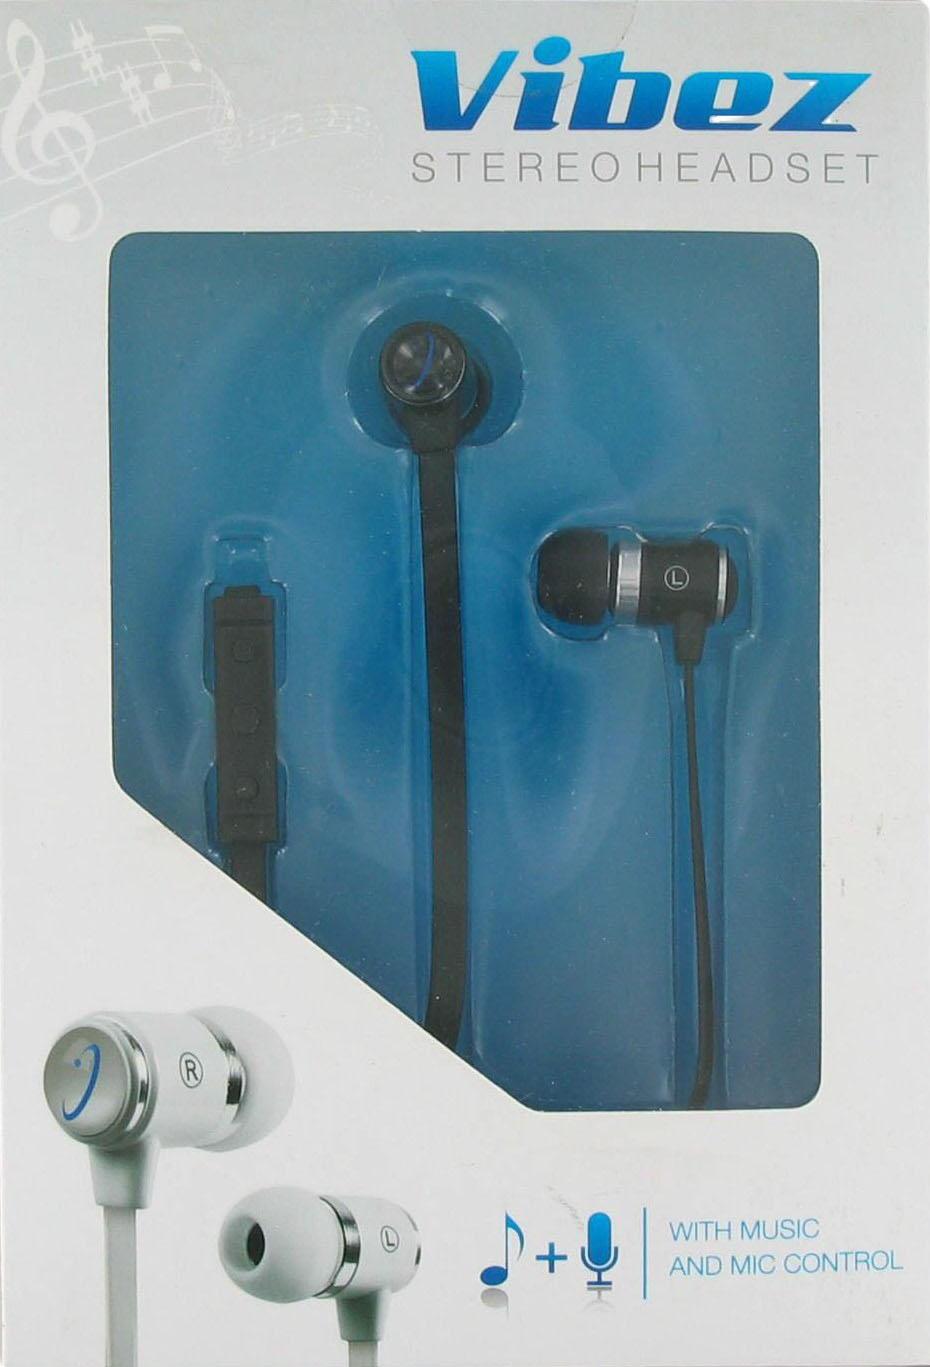 Wireless One Vibez Corded Stereo Headset - Black